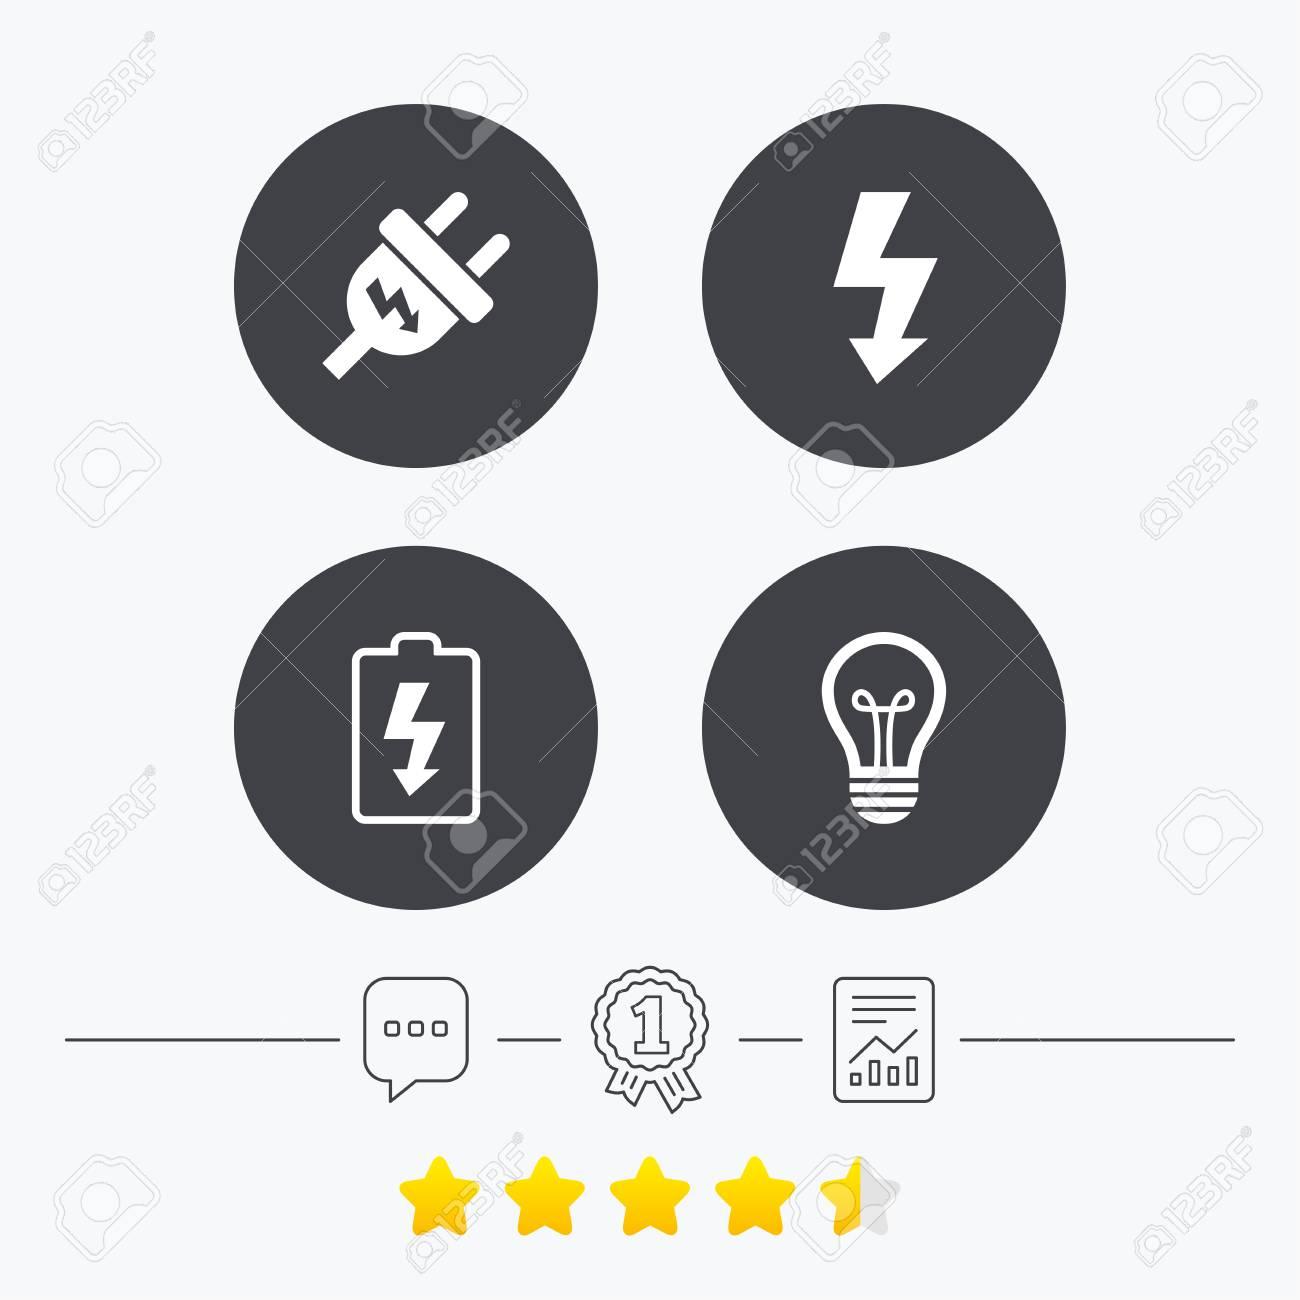 Wonderful Electric Signs And Symbols Ideas - Wiring Diagram Ideas ...